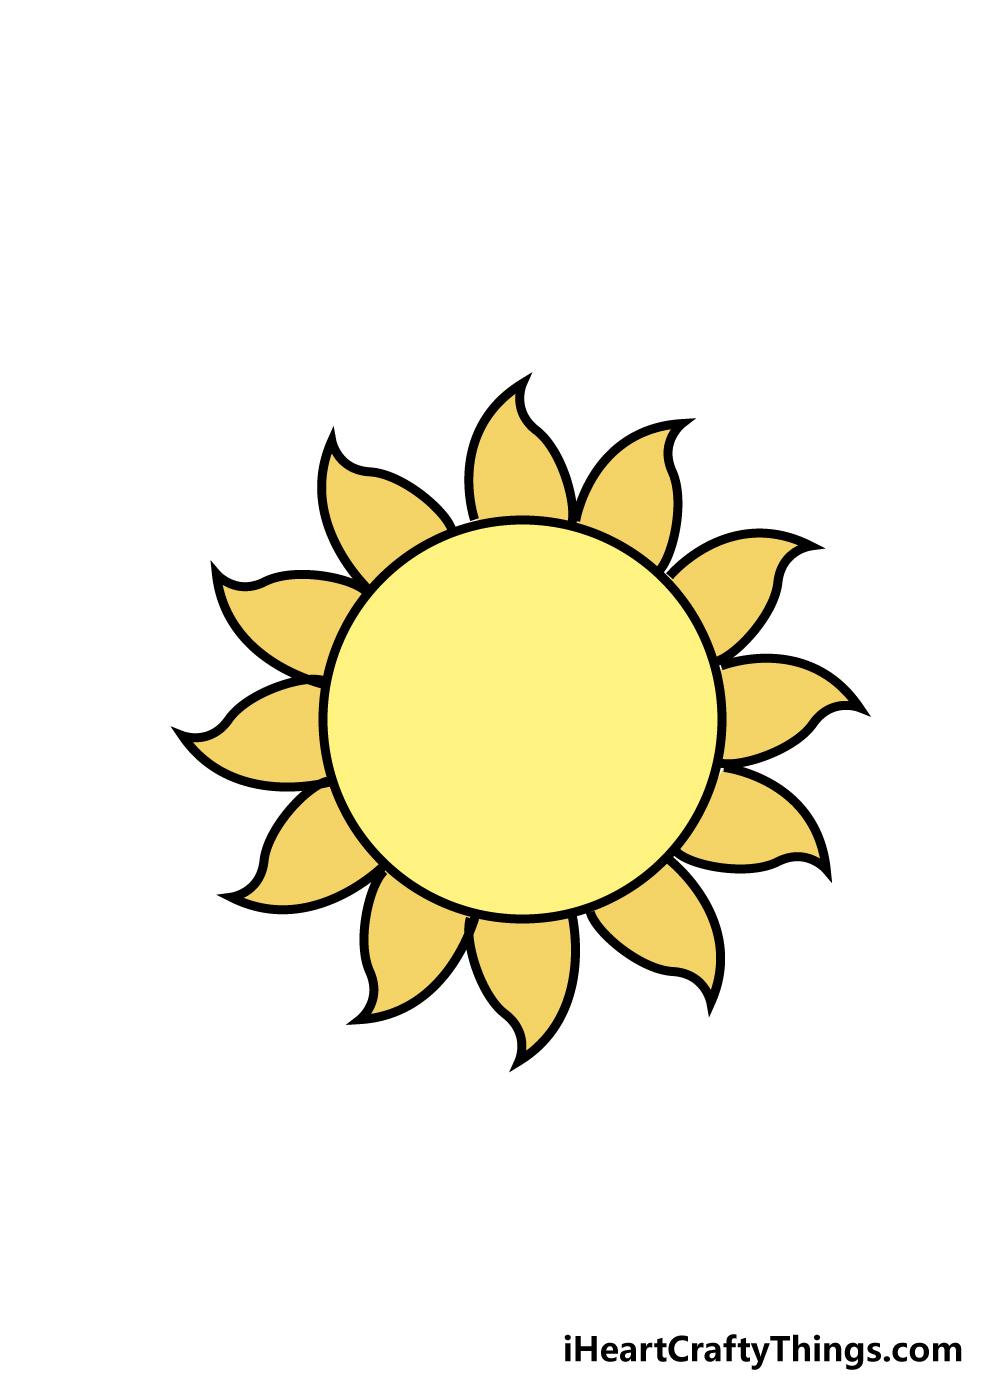 sun drawing step 7